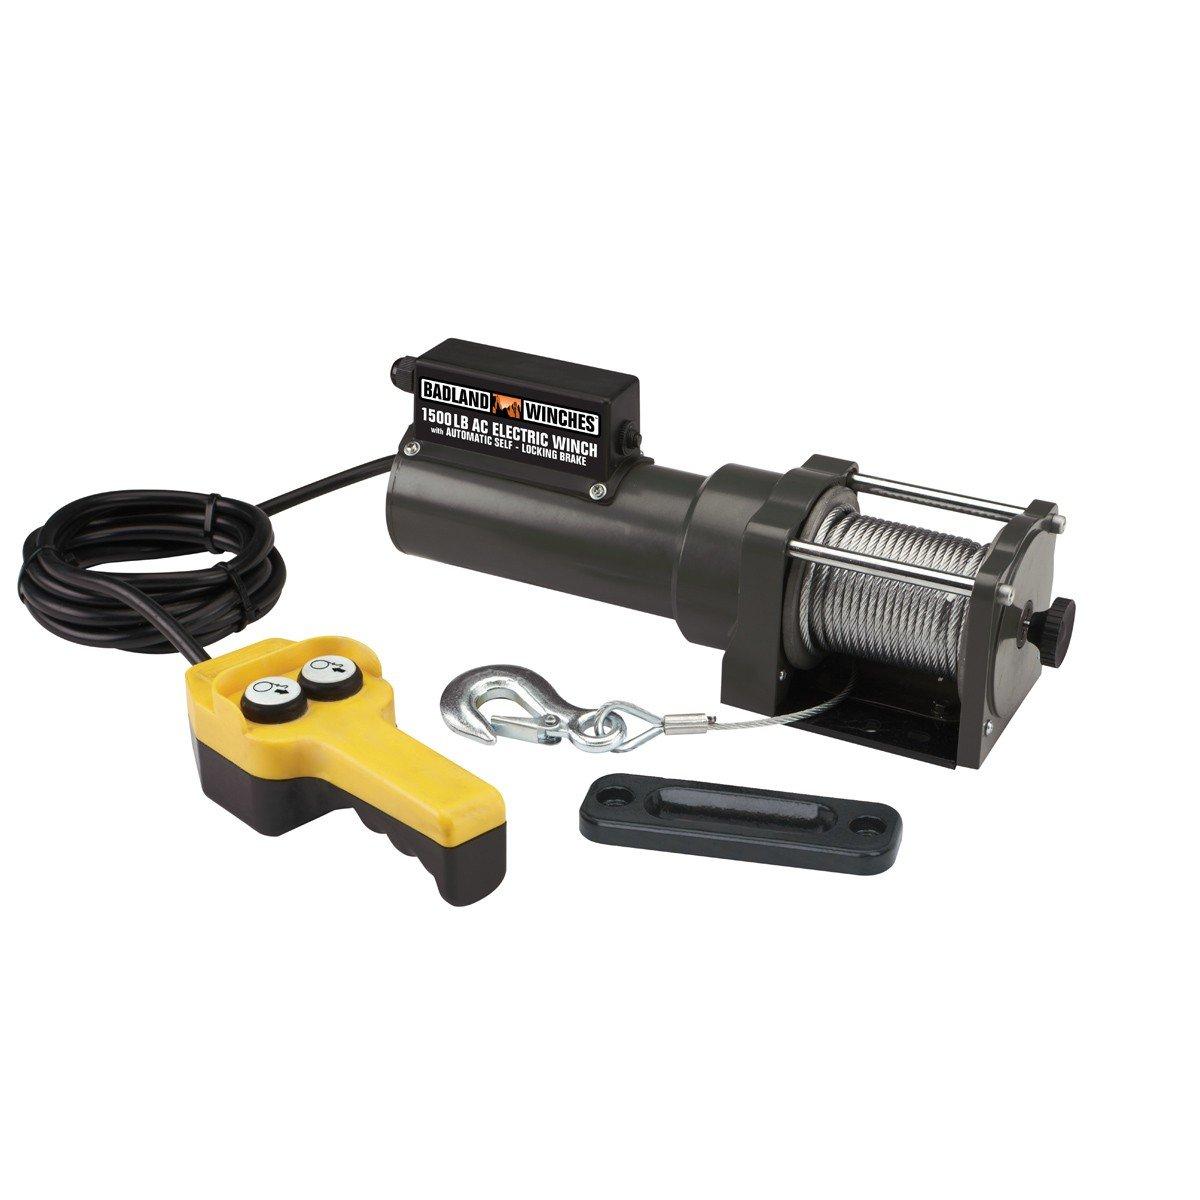 Amazon.com: 1500 lb. Capacity 120 Volt AC Electric Winch by USATNM: Home  Improvement